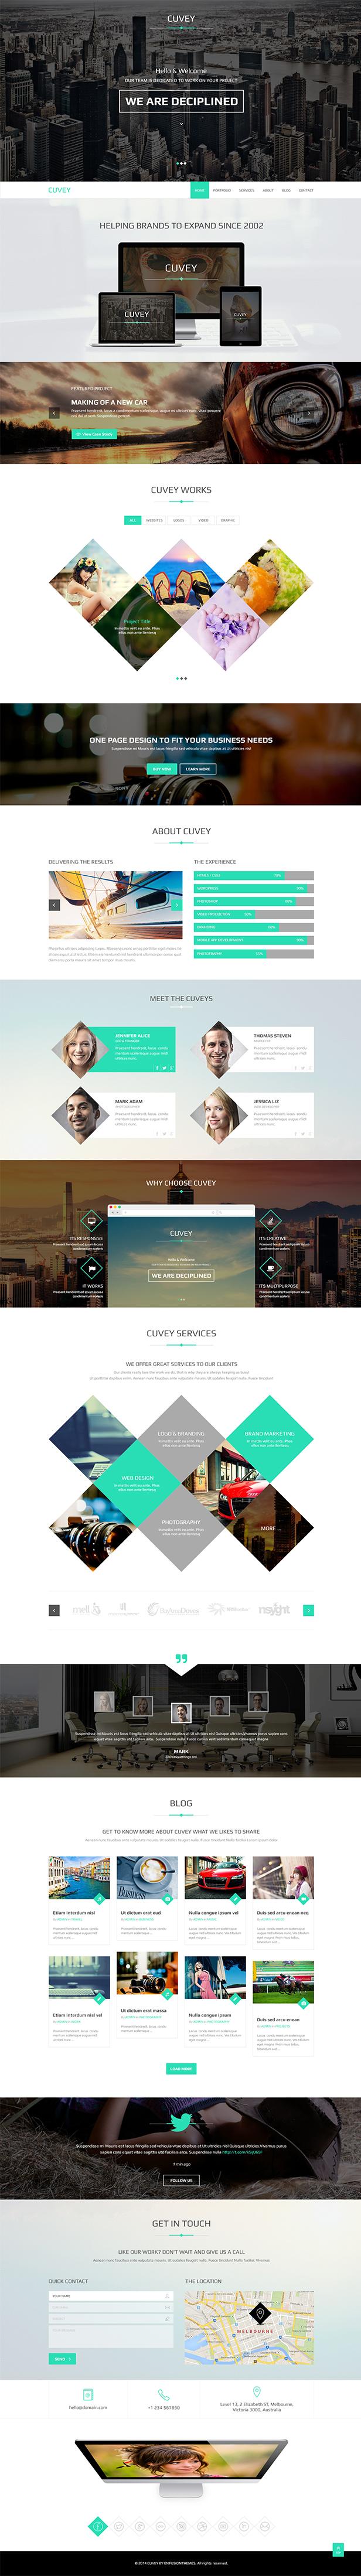 Cuvey | Multi-Purpose Parallax PSD Landing Page  - 5